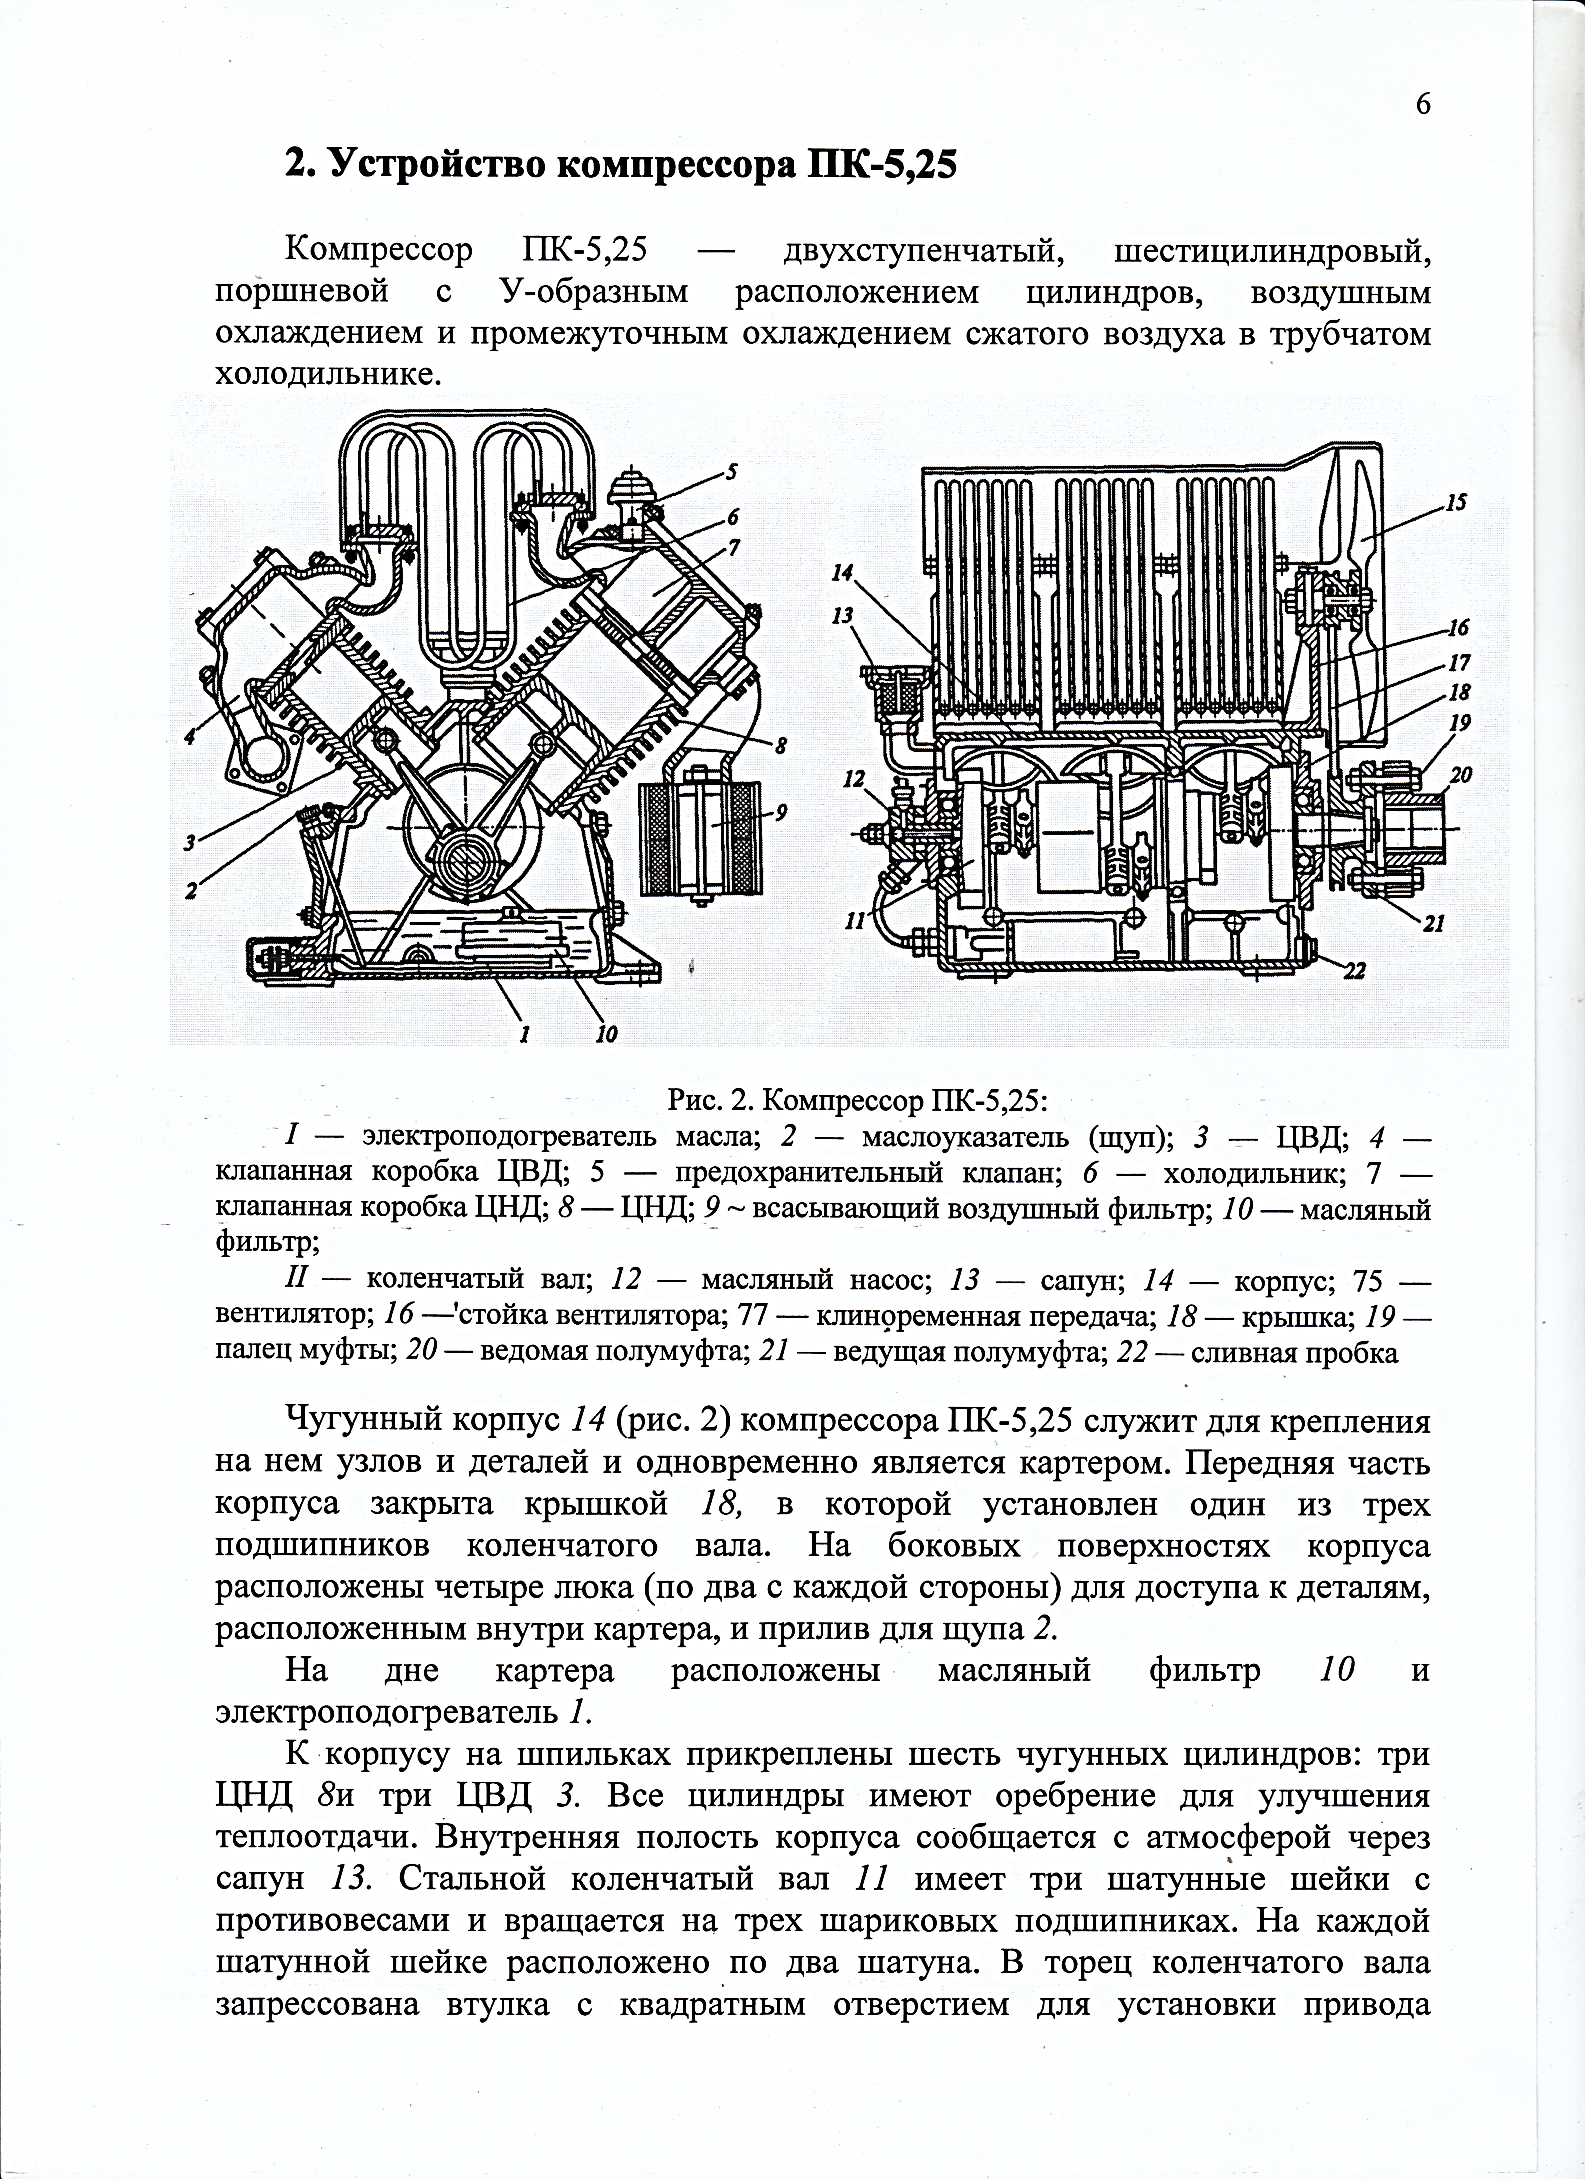 Инструкция по охране труда при работе с компрессорами